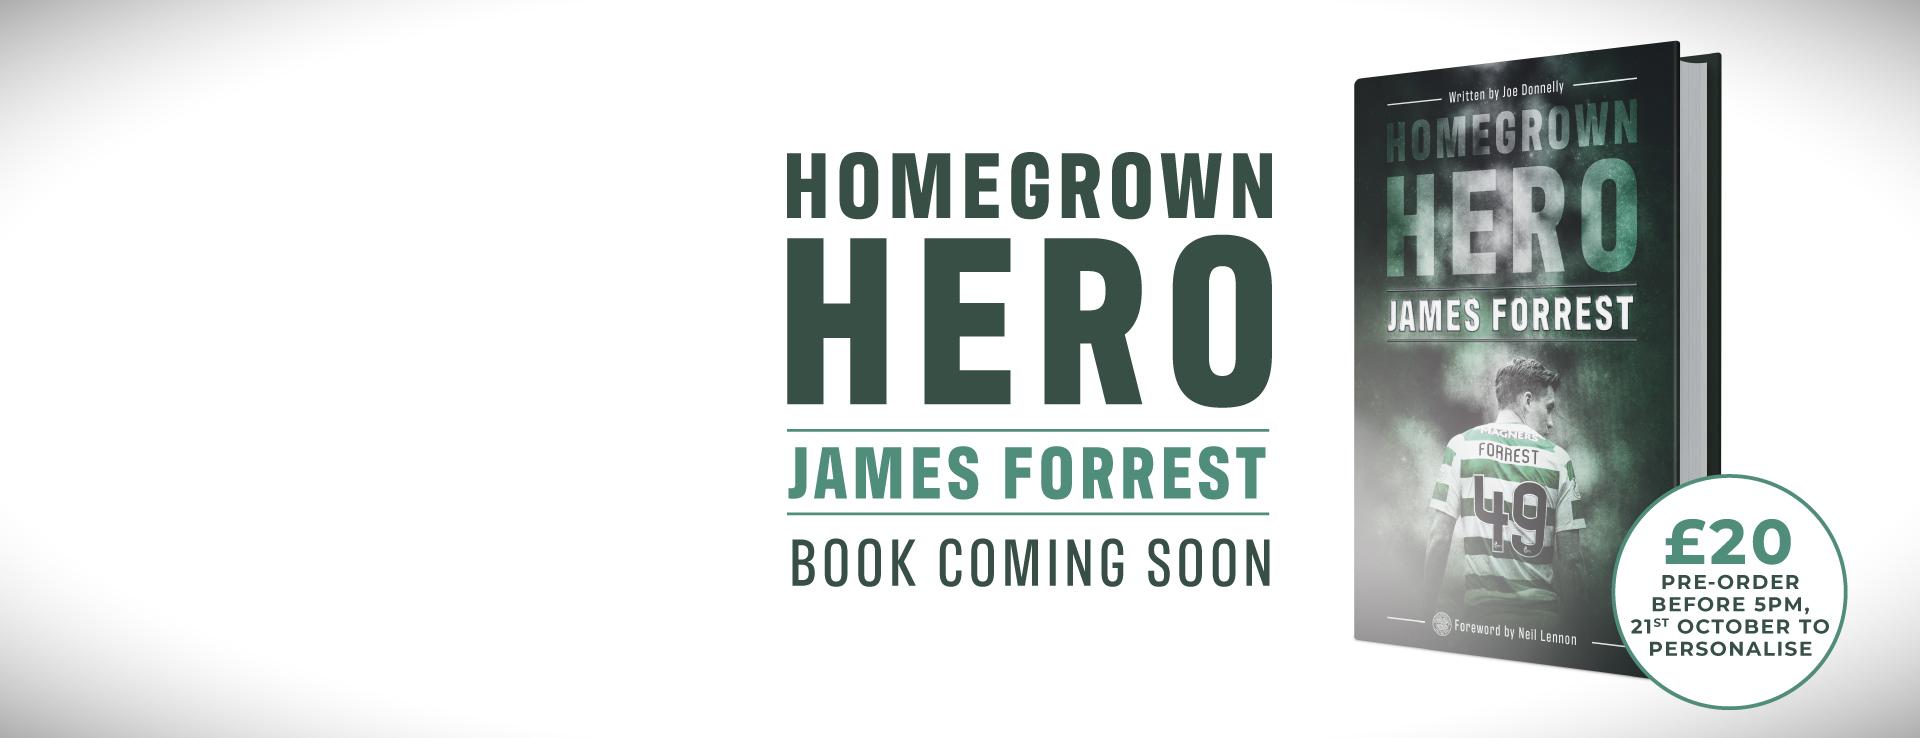 Homegrown Hero Book